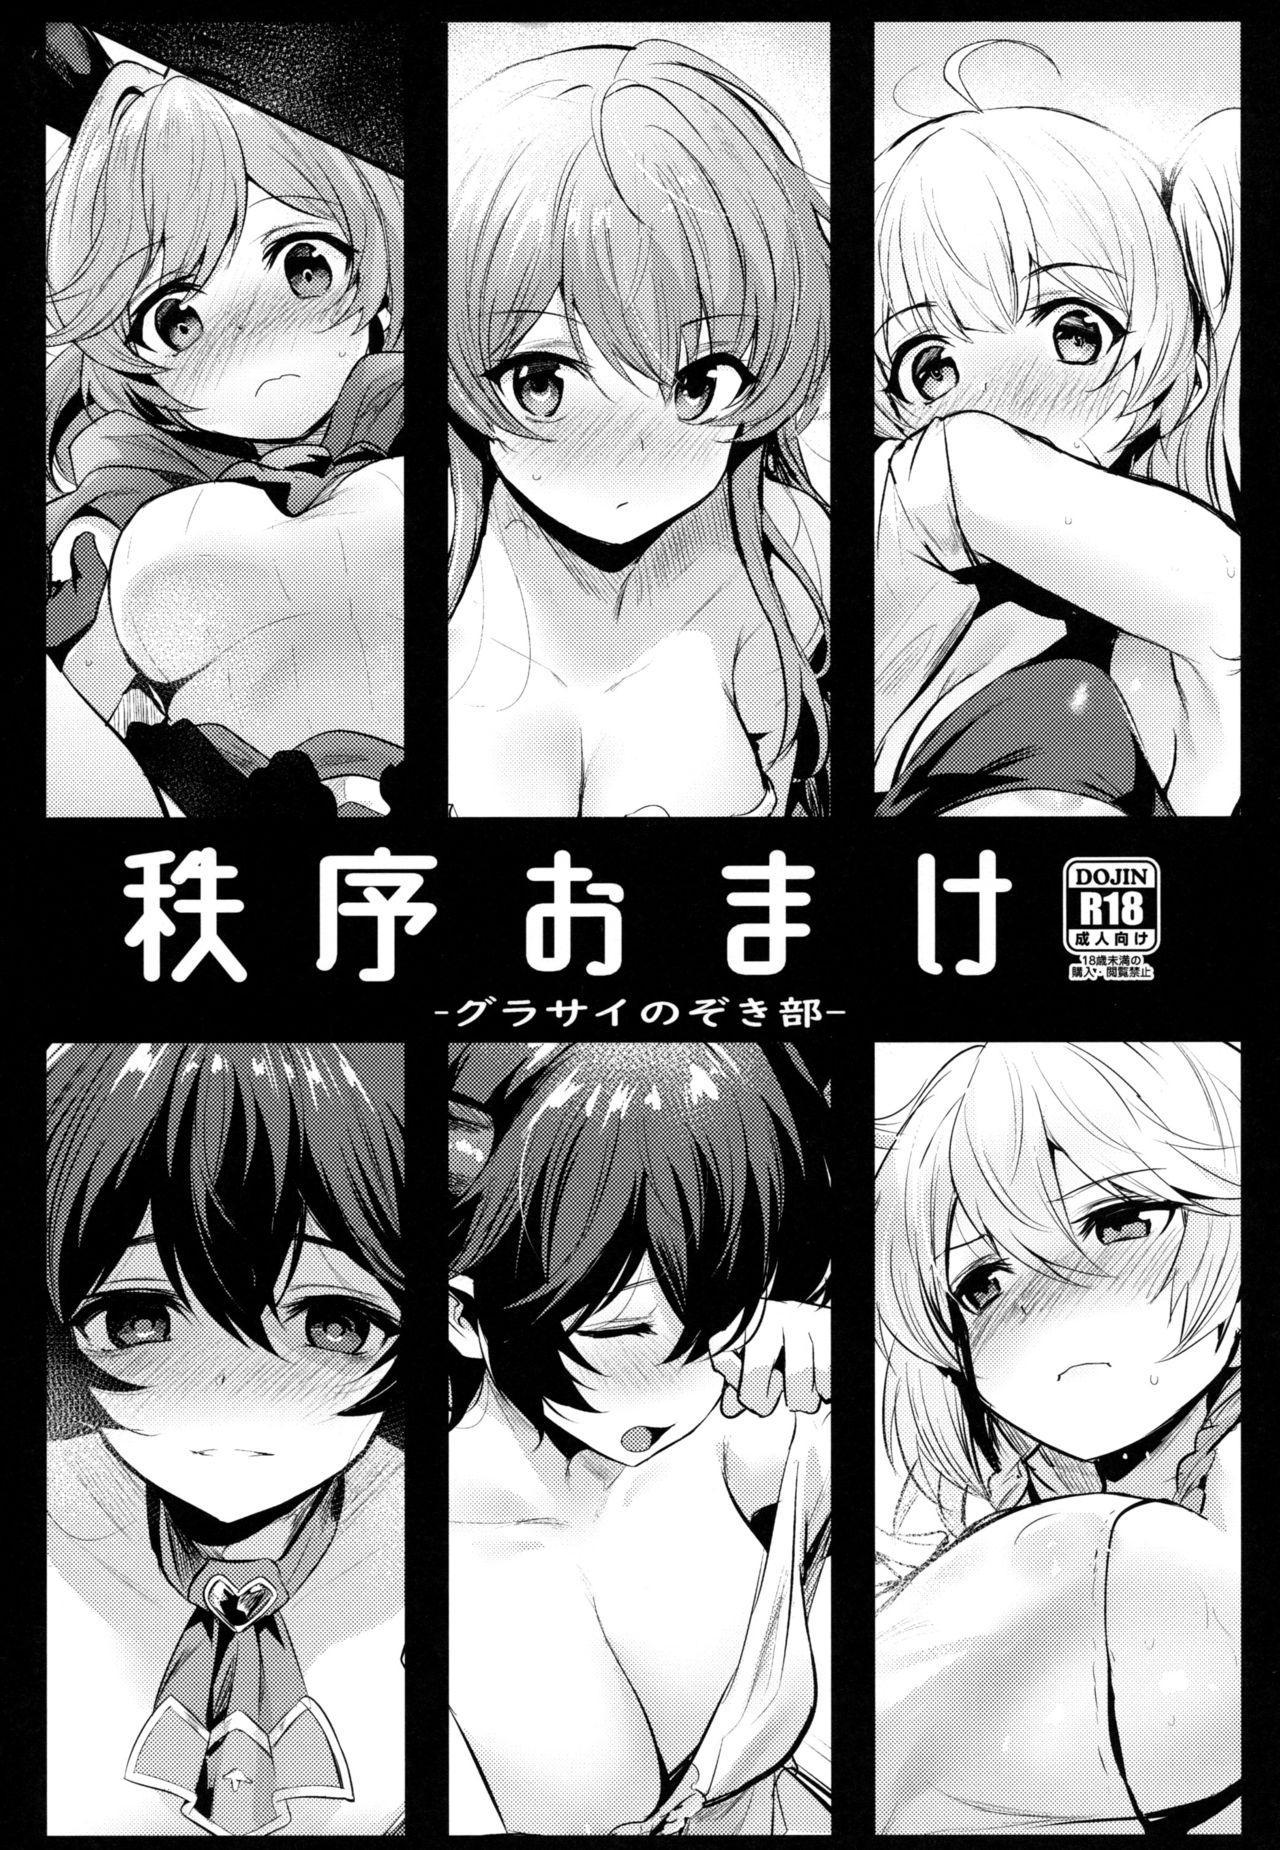 Chitsujo Omake 0